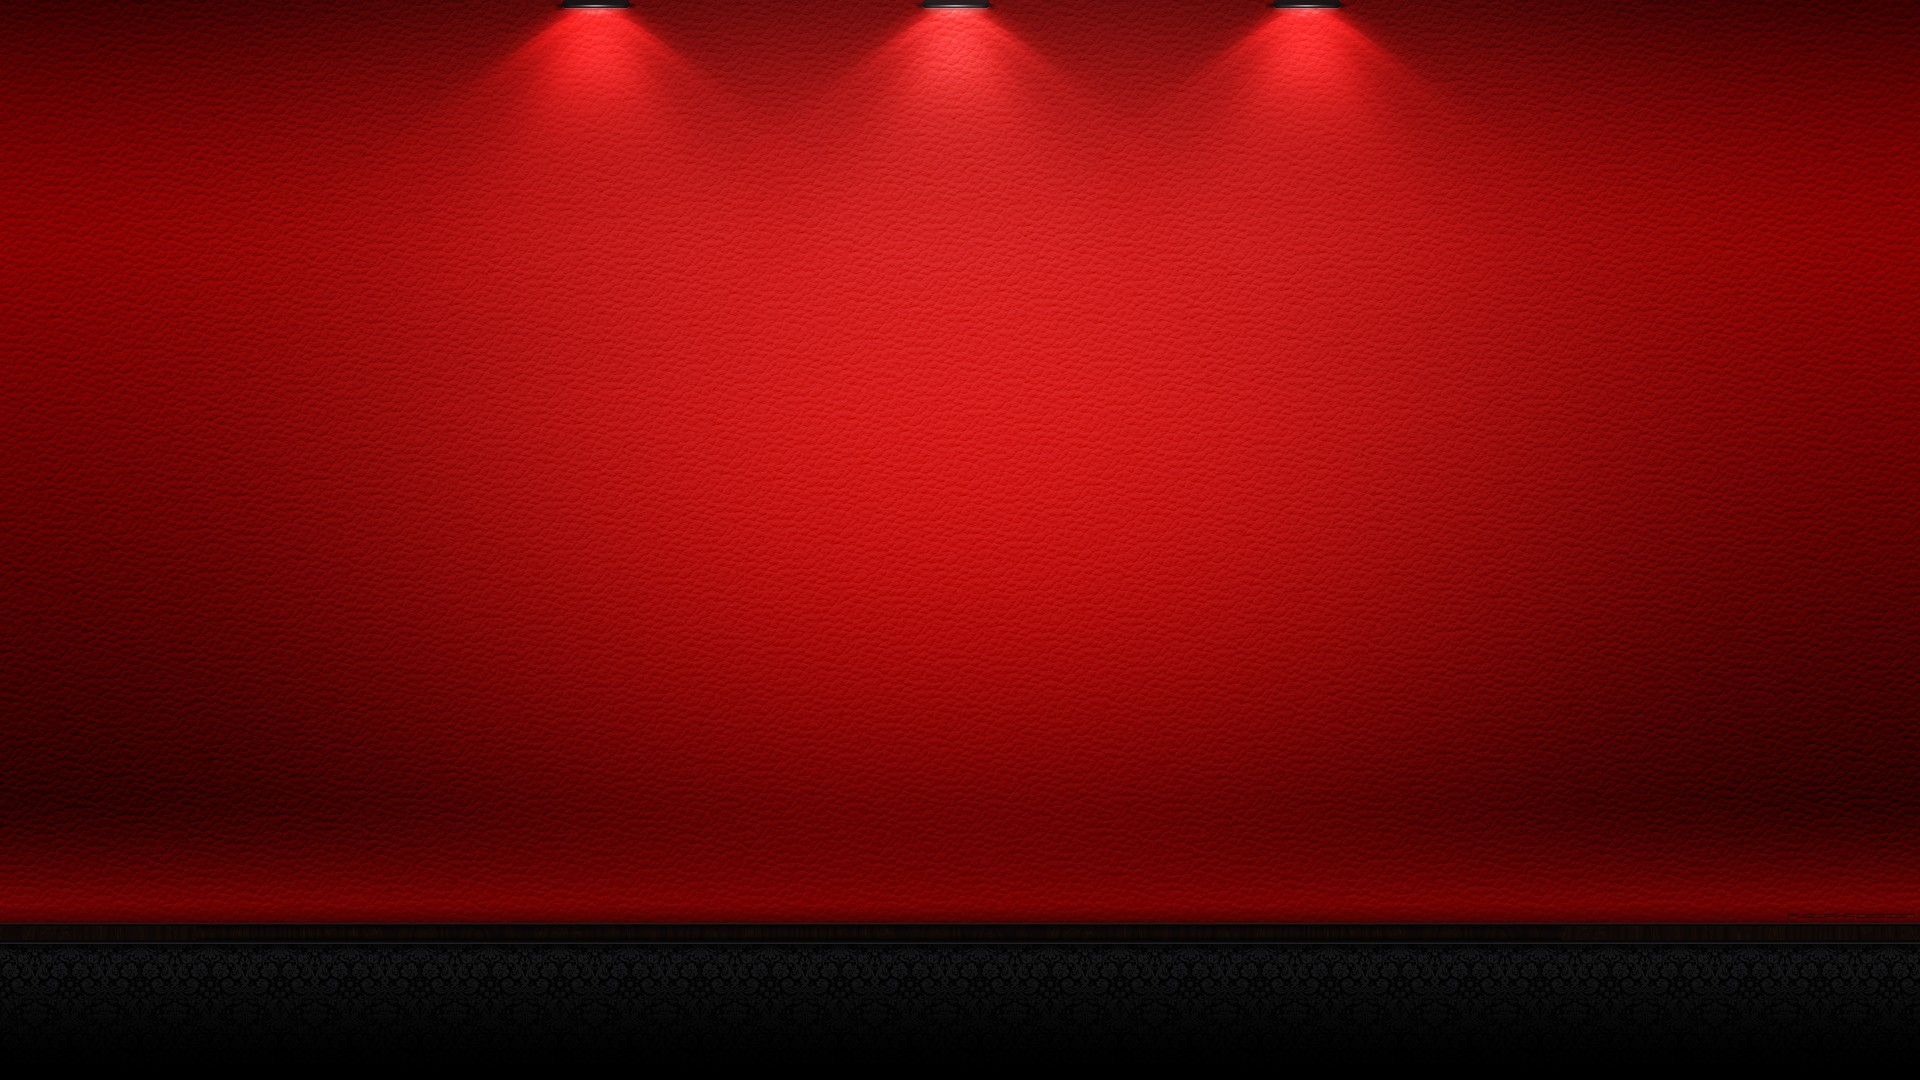 Red Wallpaper 721 Widescreen Desktop